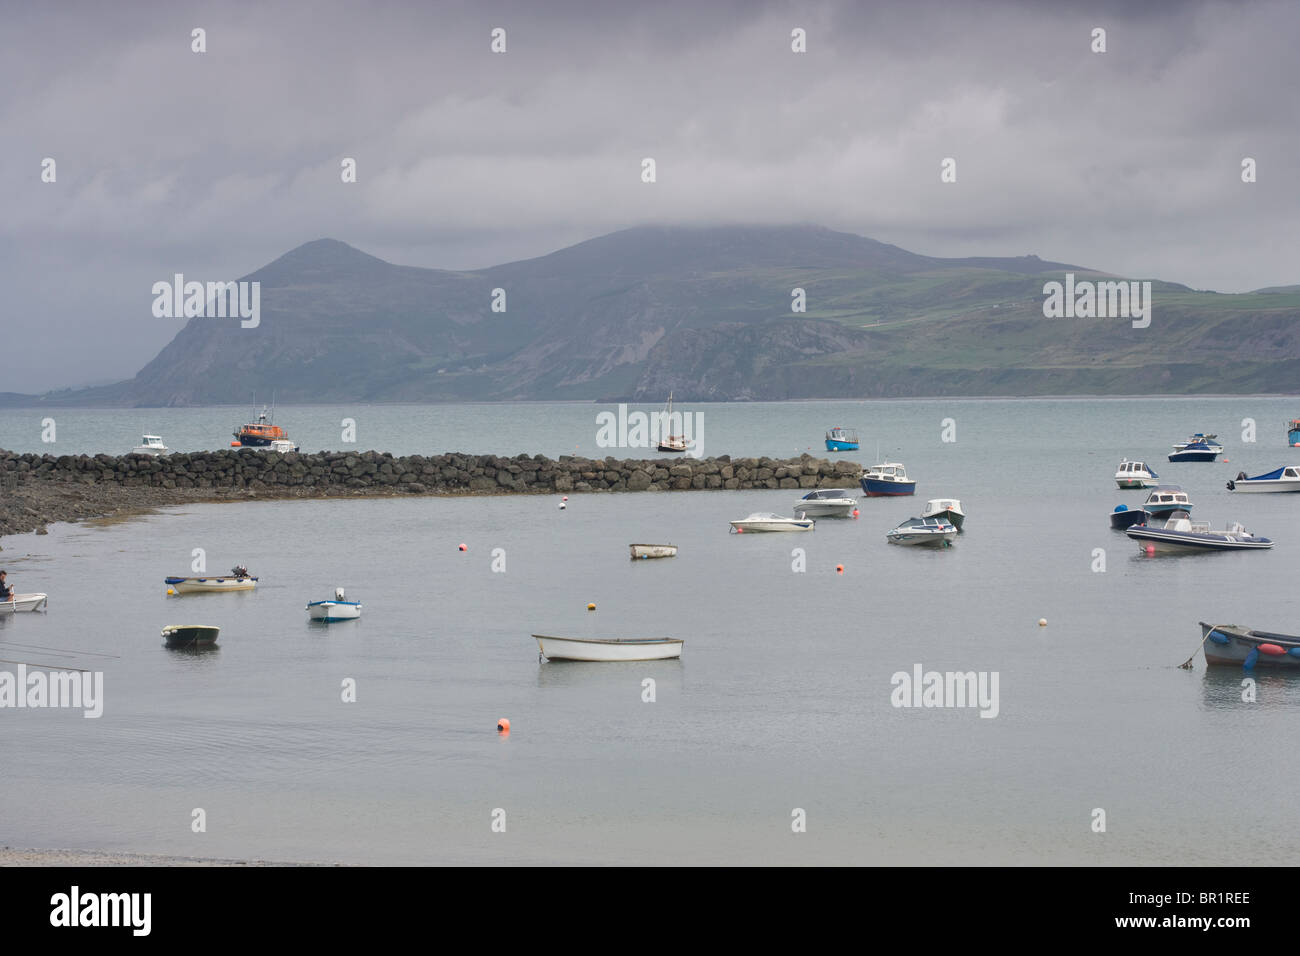 Nefyn, view from Ty Coch inn, Llyn or Lleyn Peninsular Wales - Stock Image